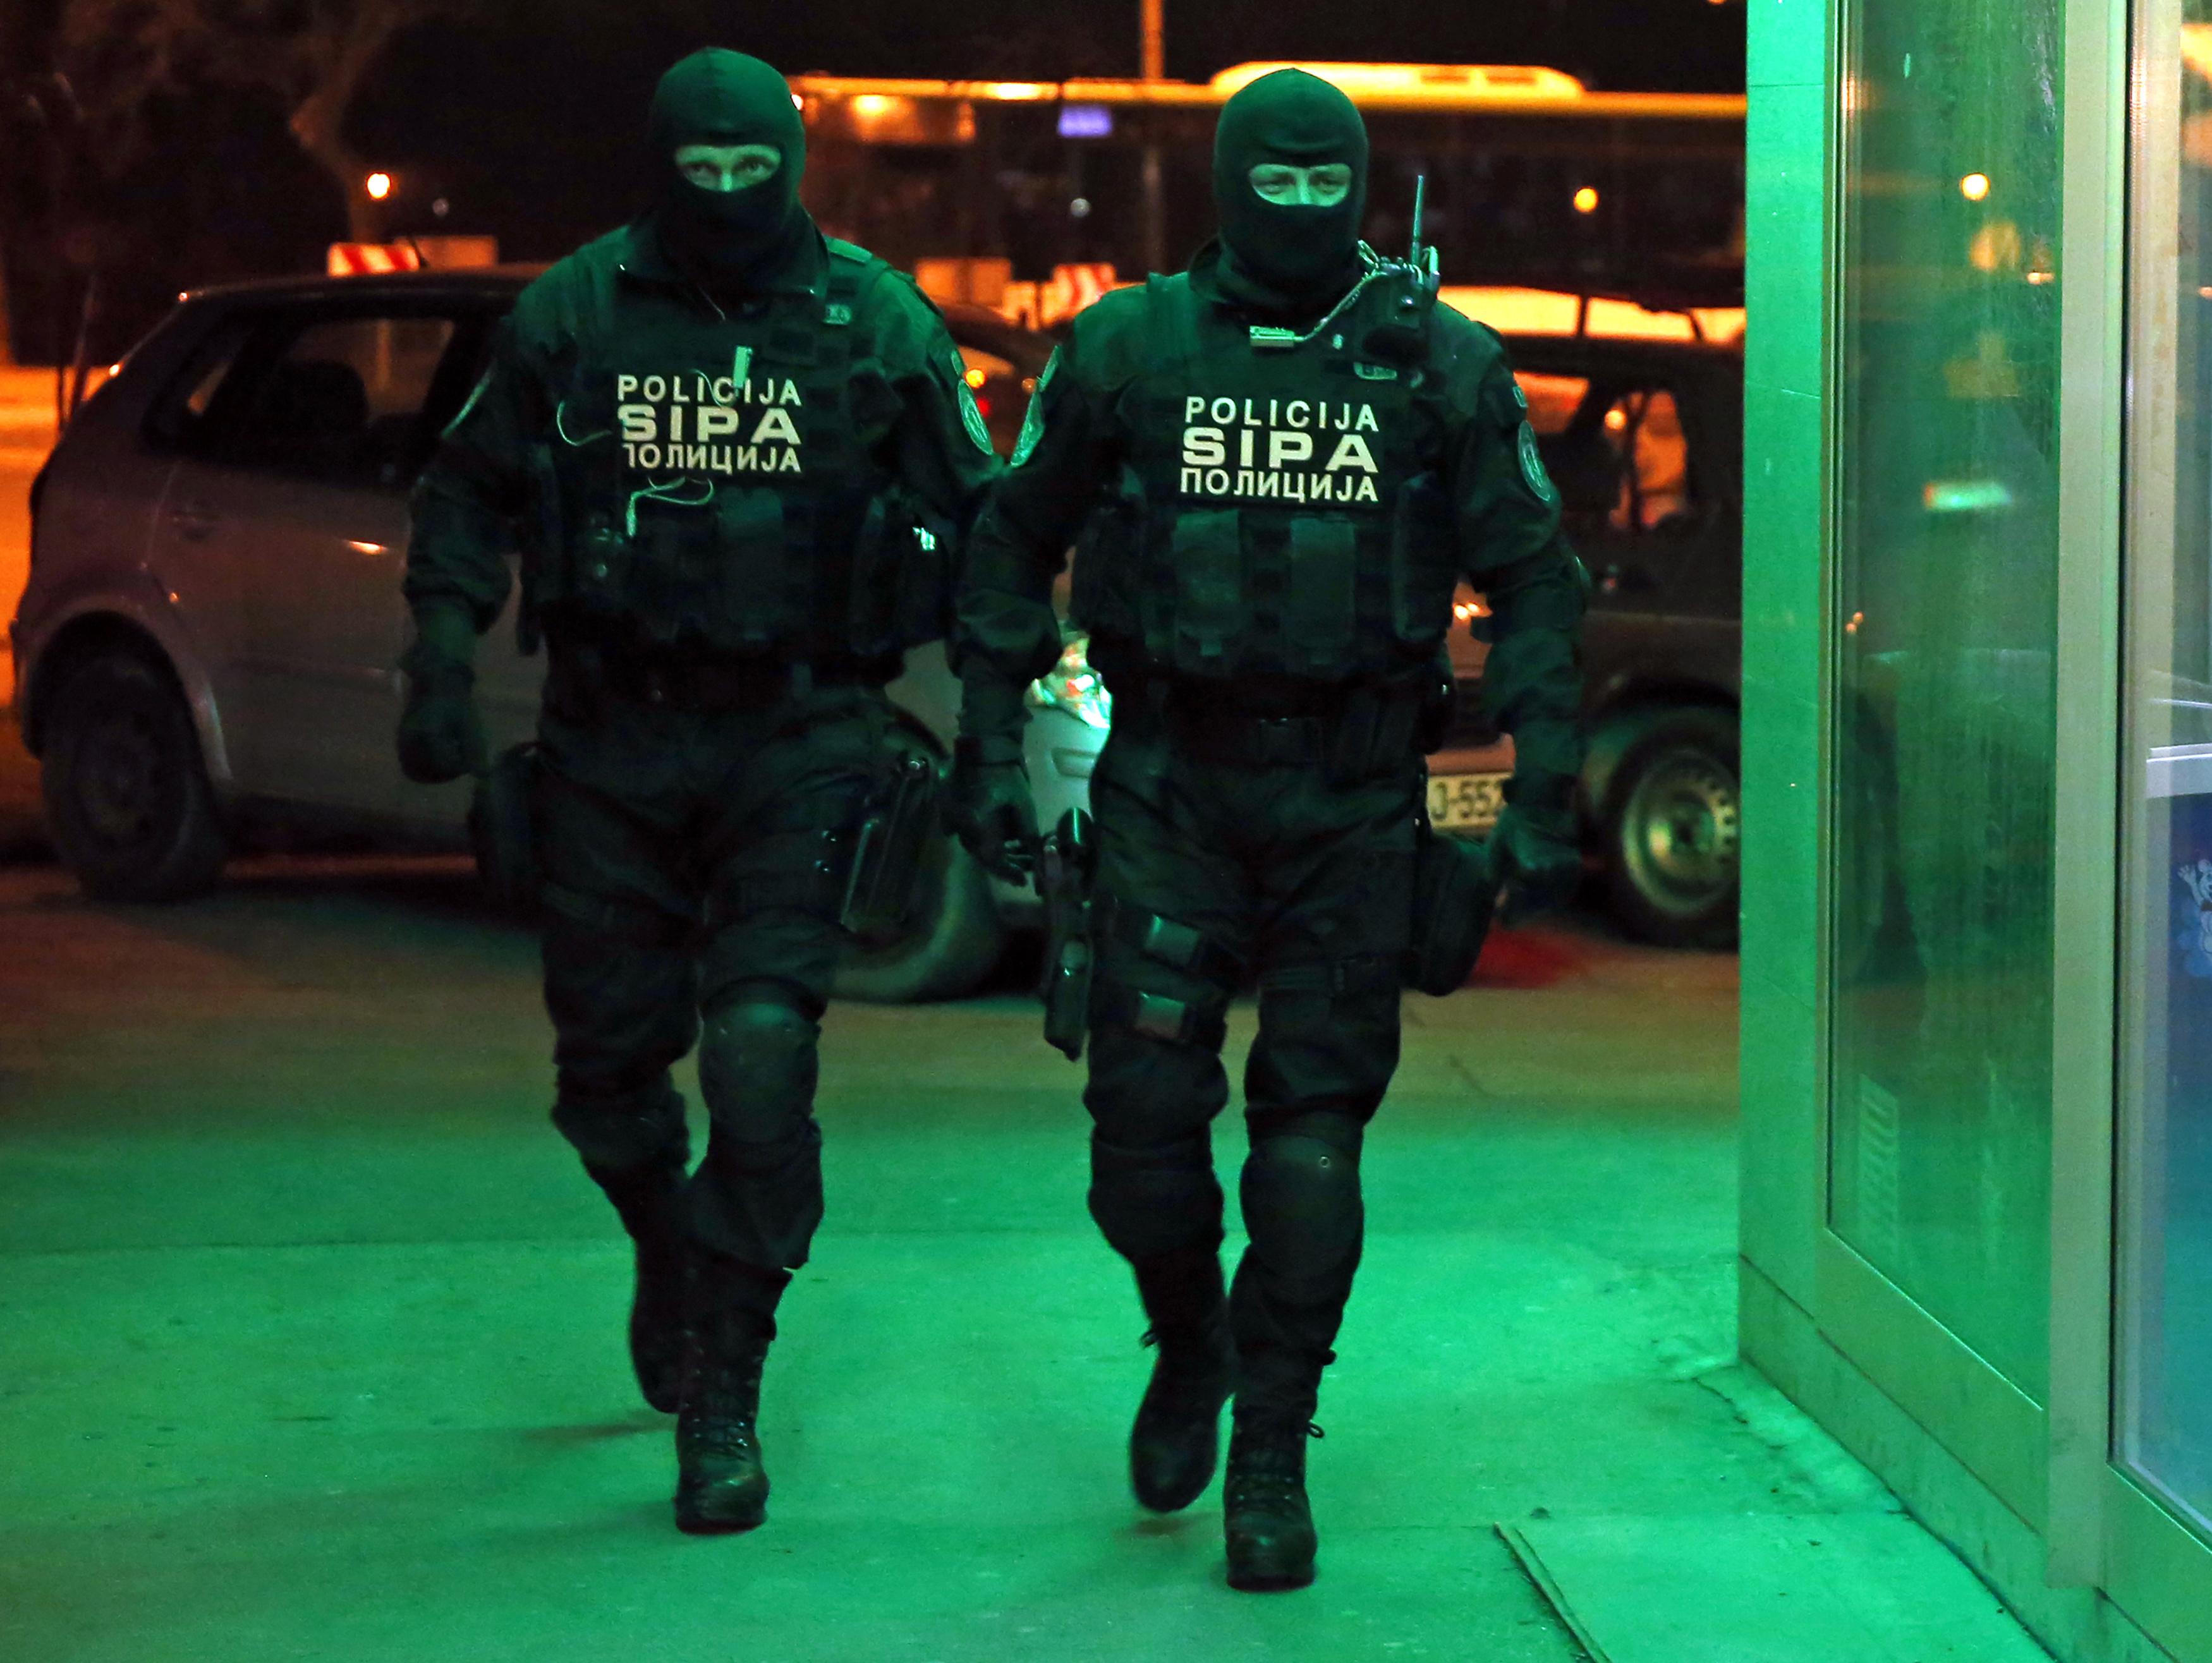 Bosna policija specijalci